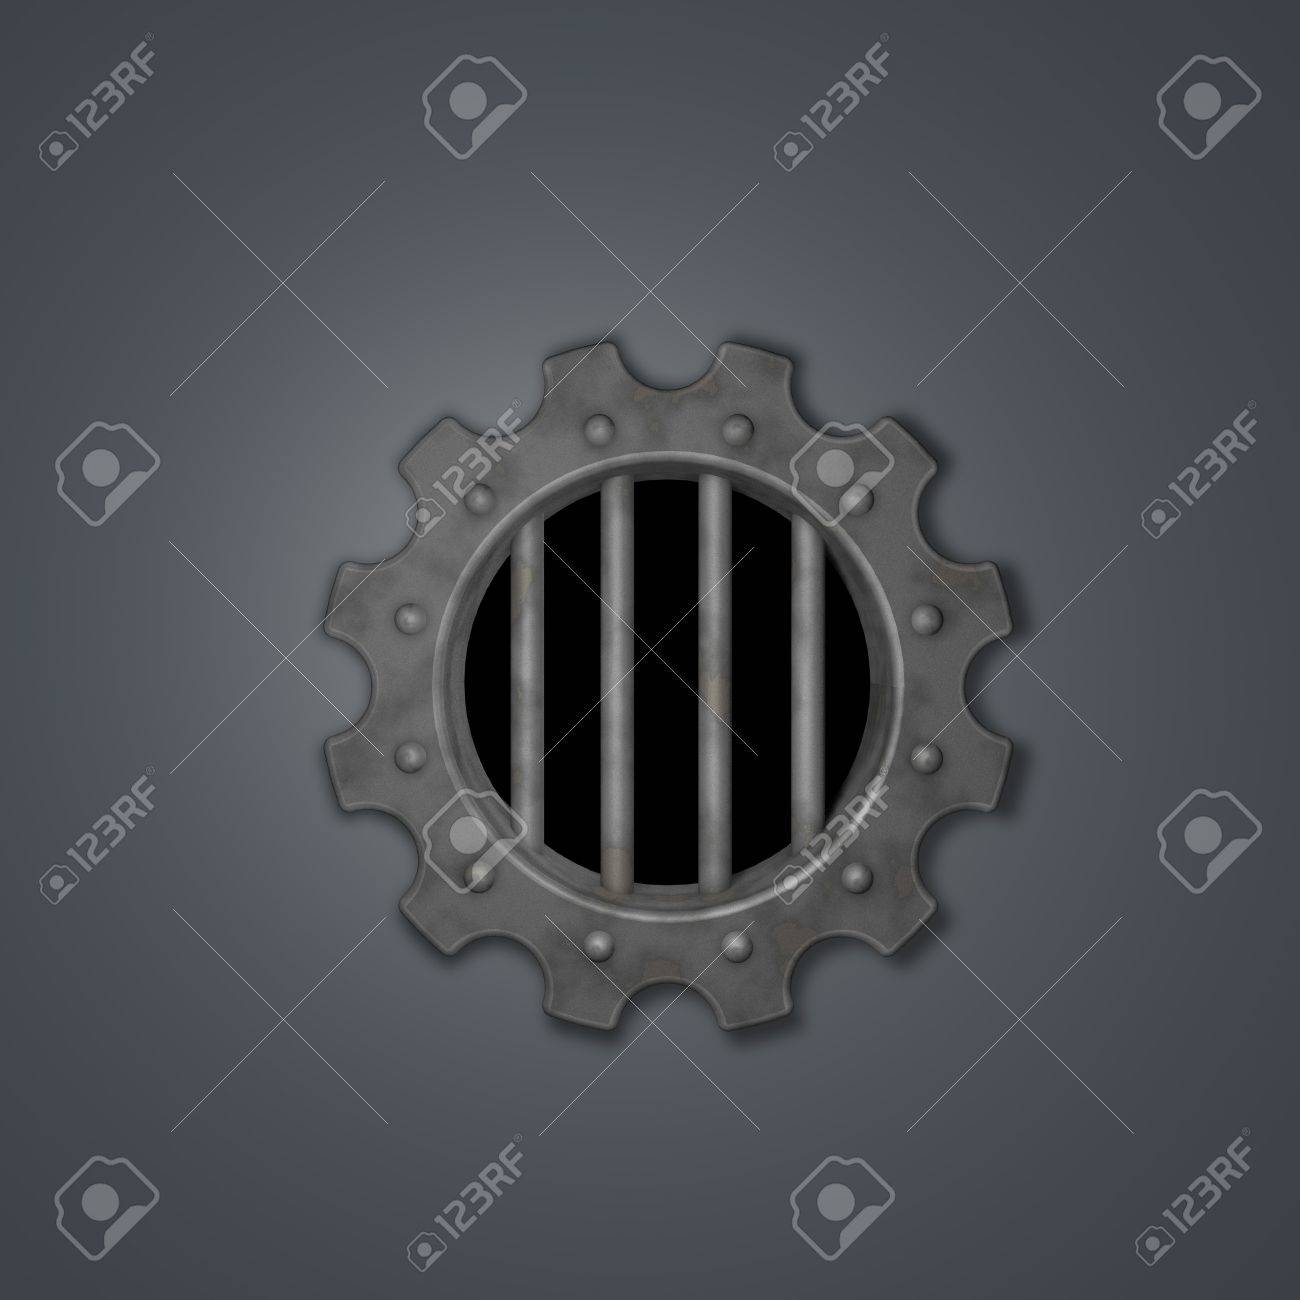 gear wheel prison window - 3d illustration Stock Illustration - 16711093